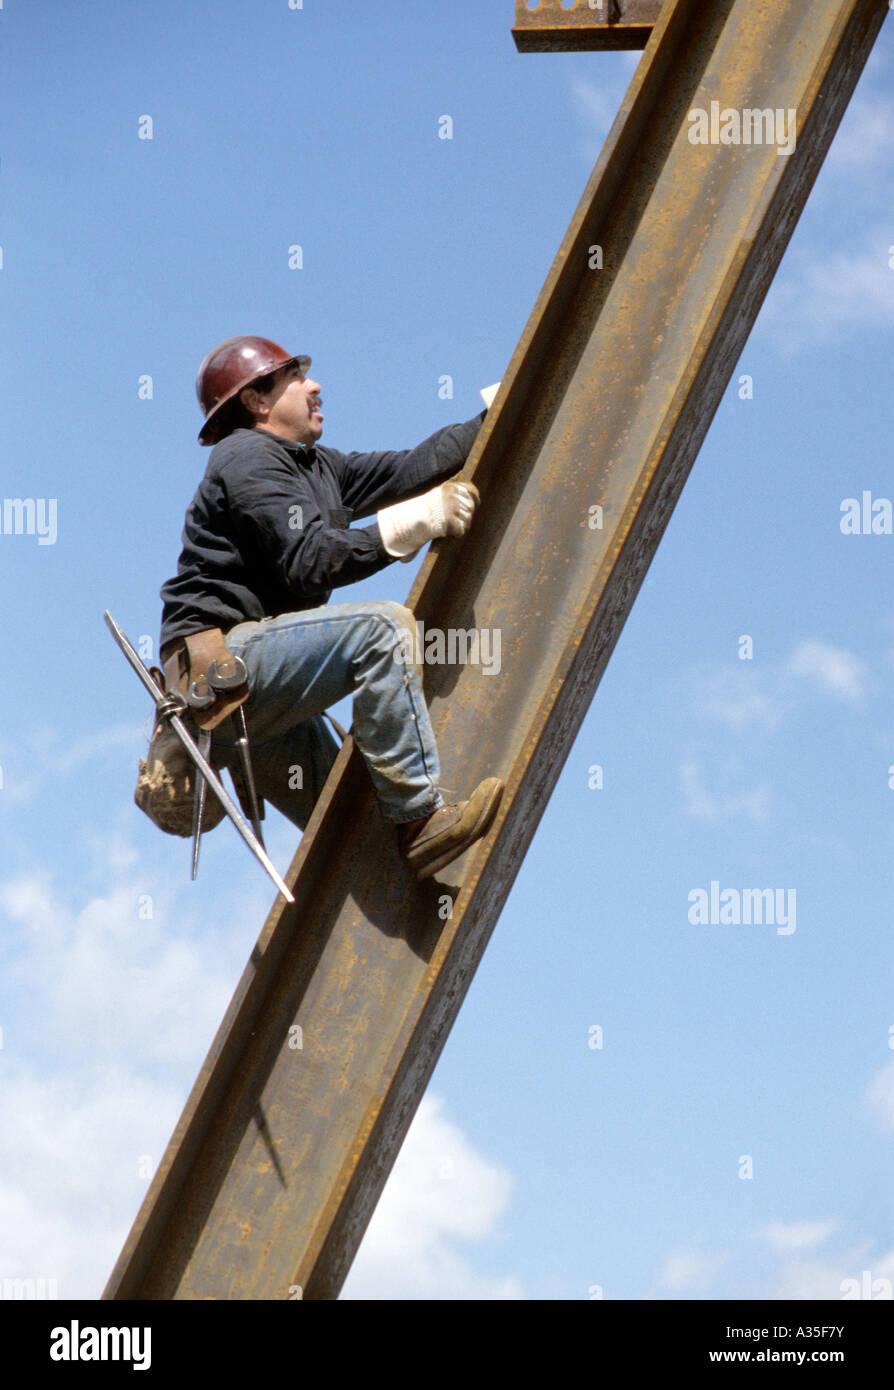 Mohawk Indian Iron Worker Connector John Diago Climbs